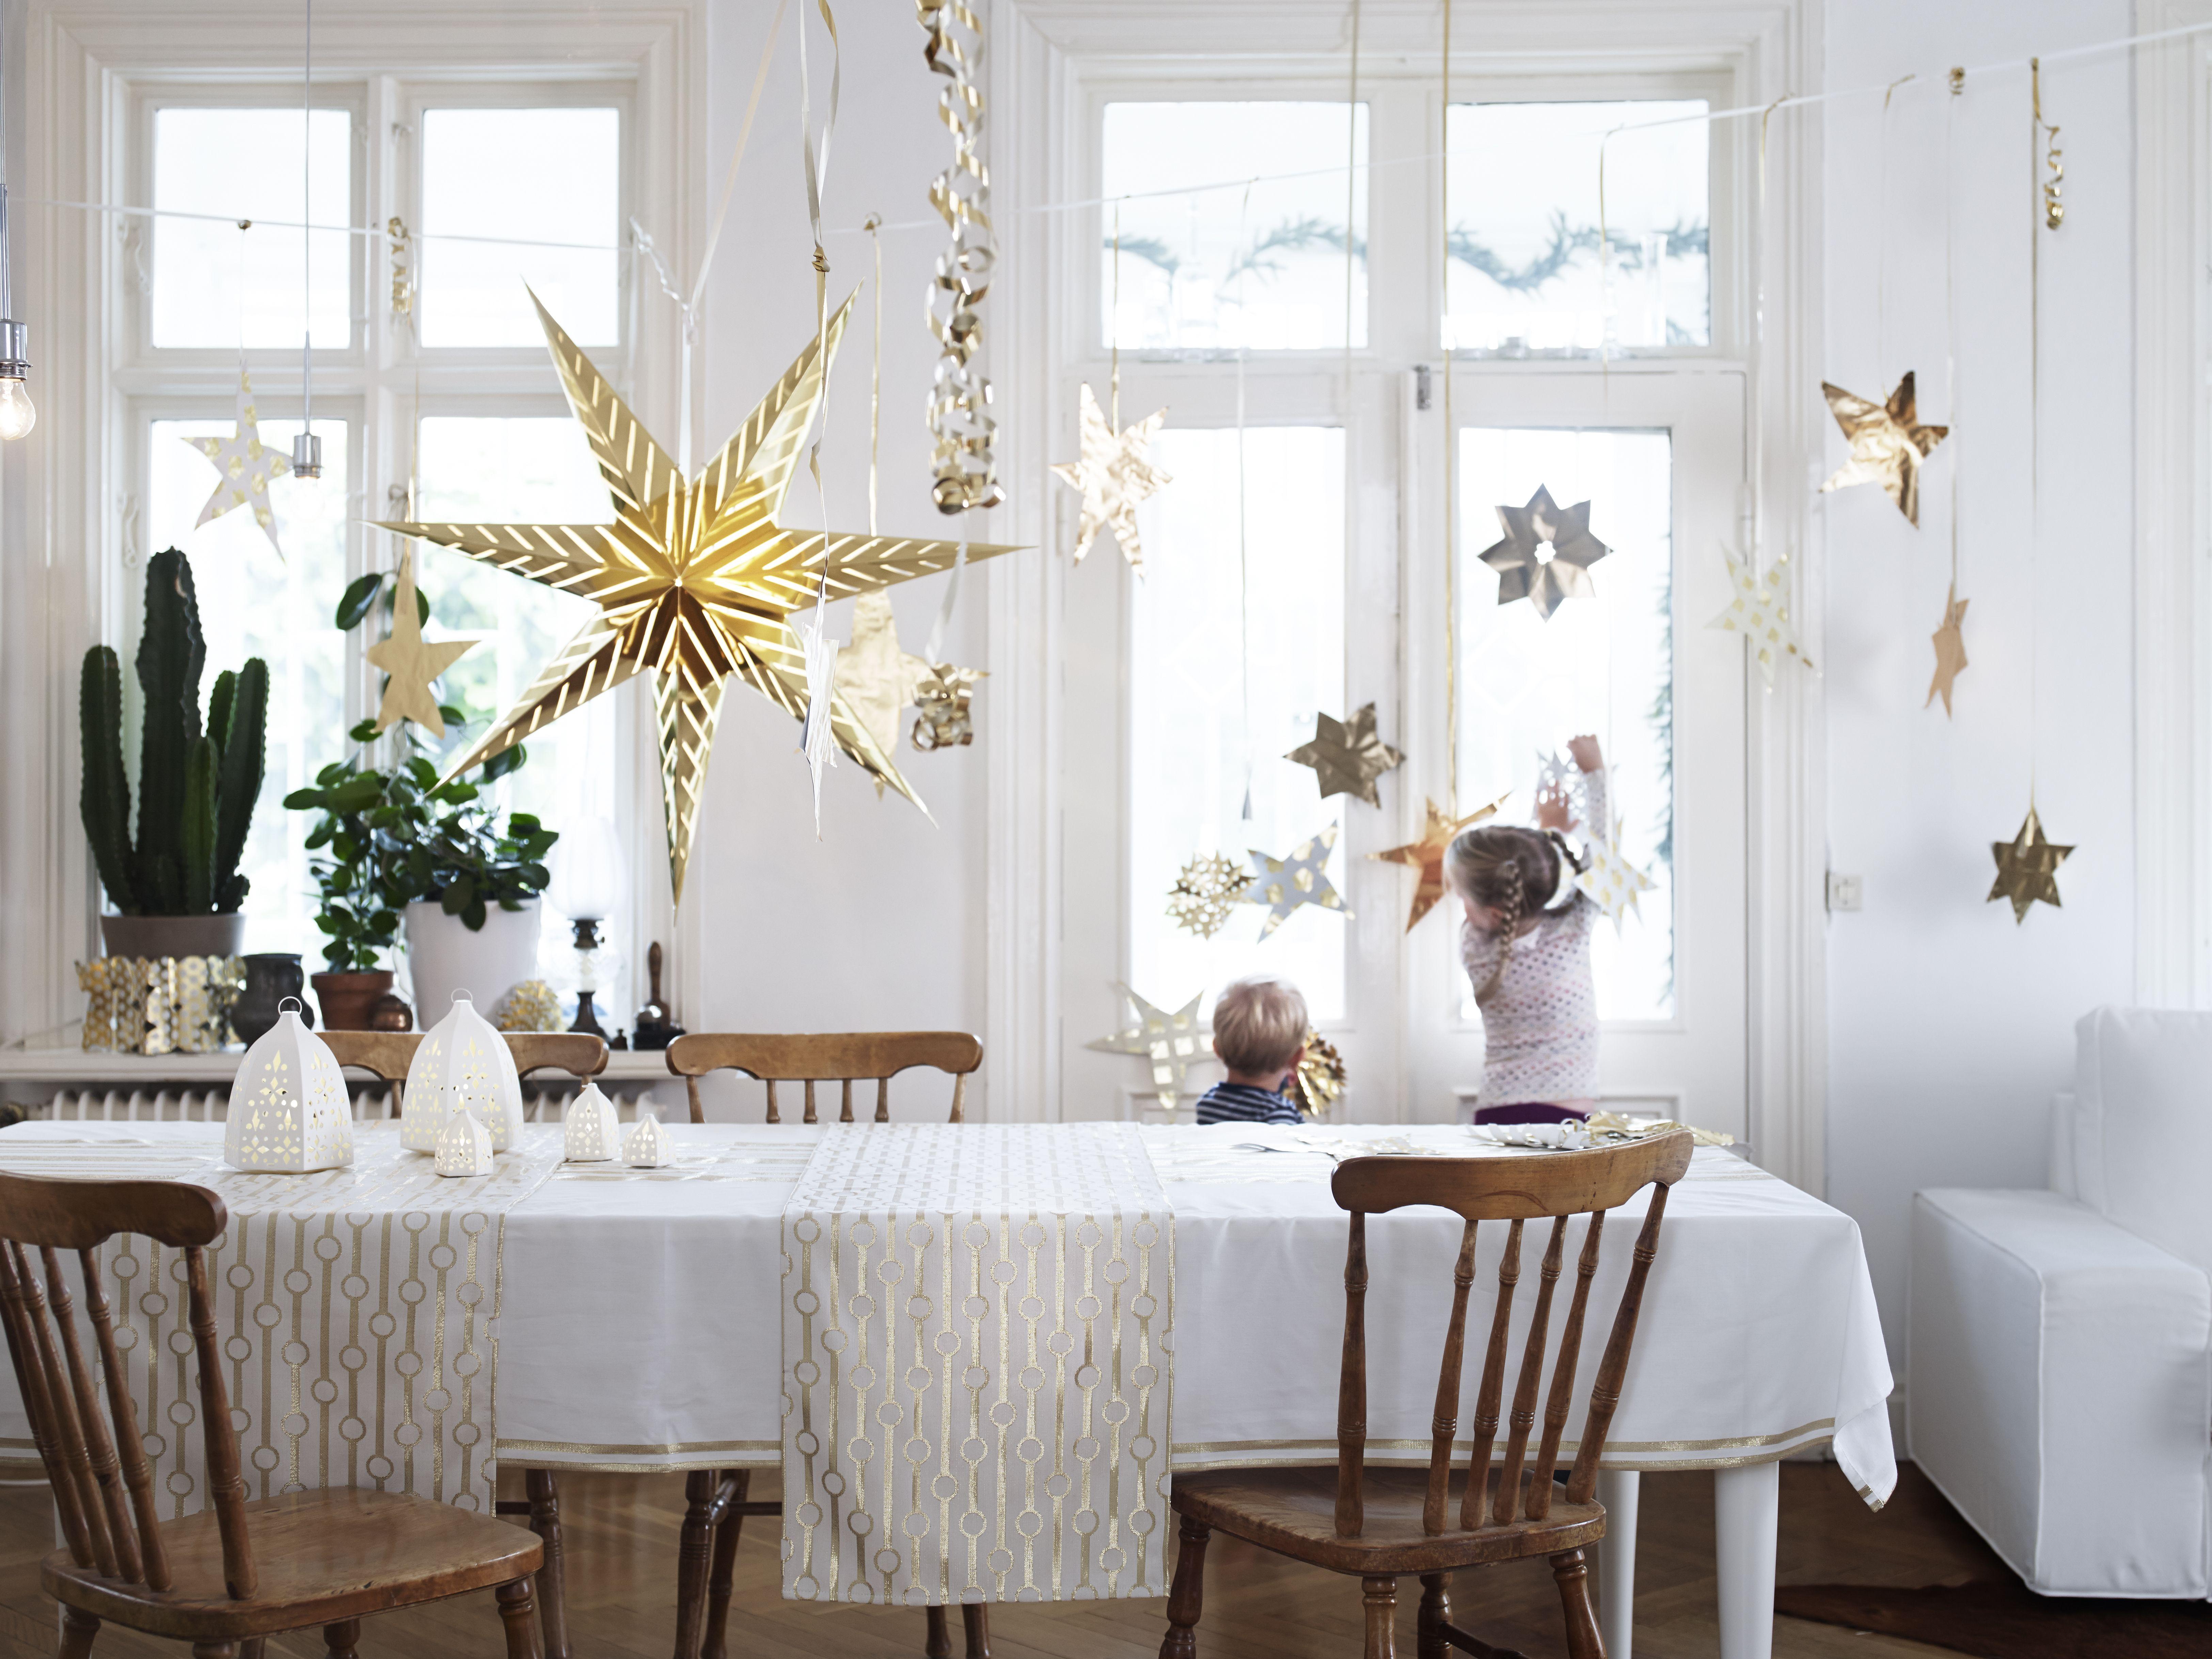 Pin by Julie Wijffels on Christmas | Pinterest